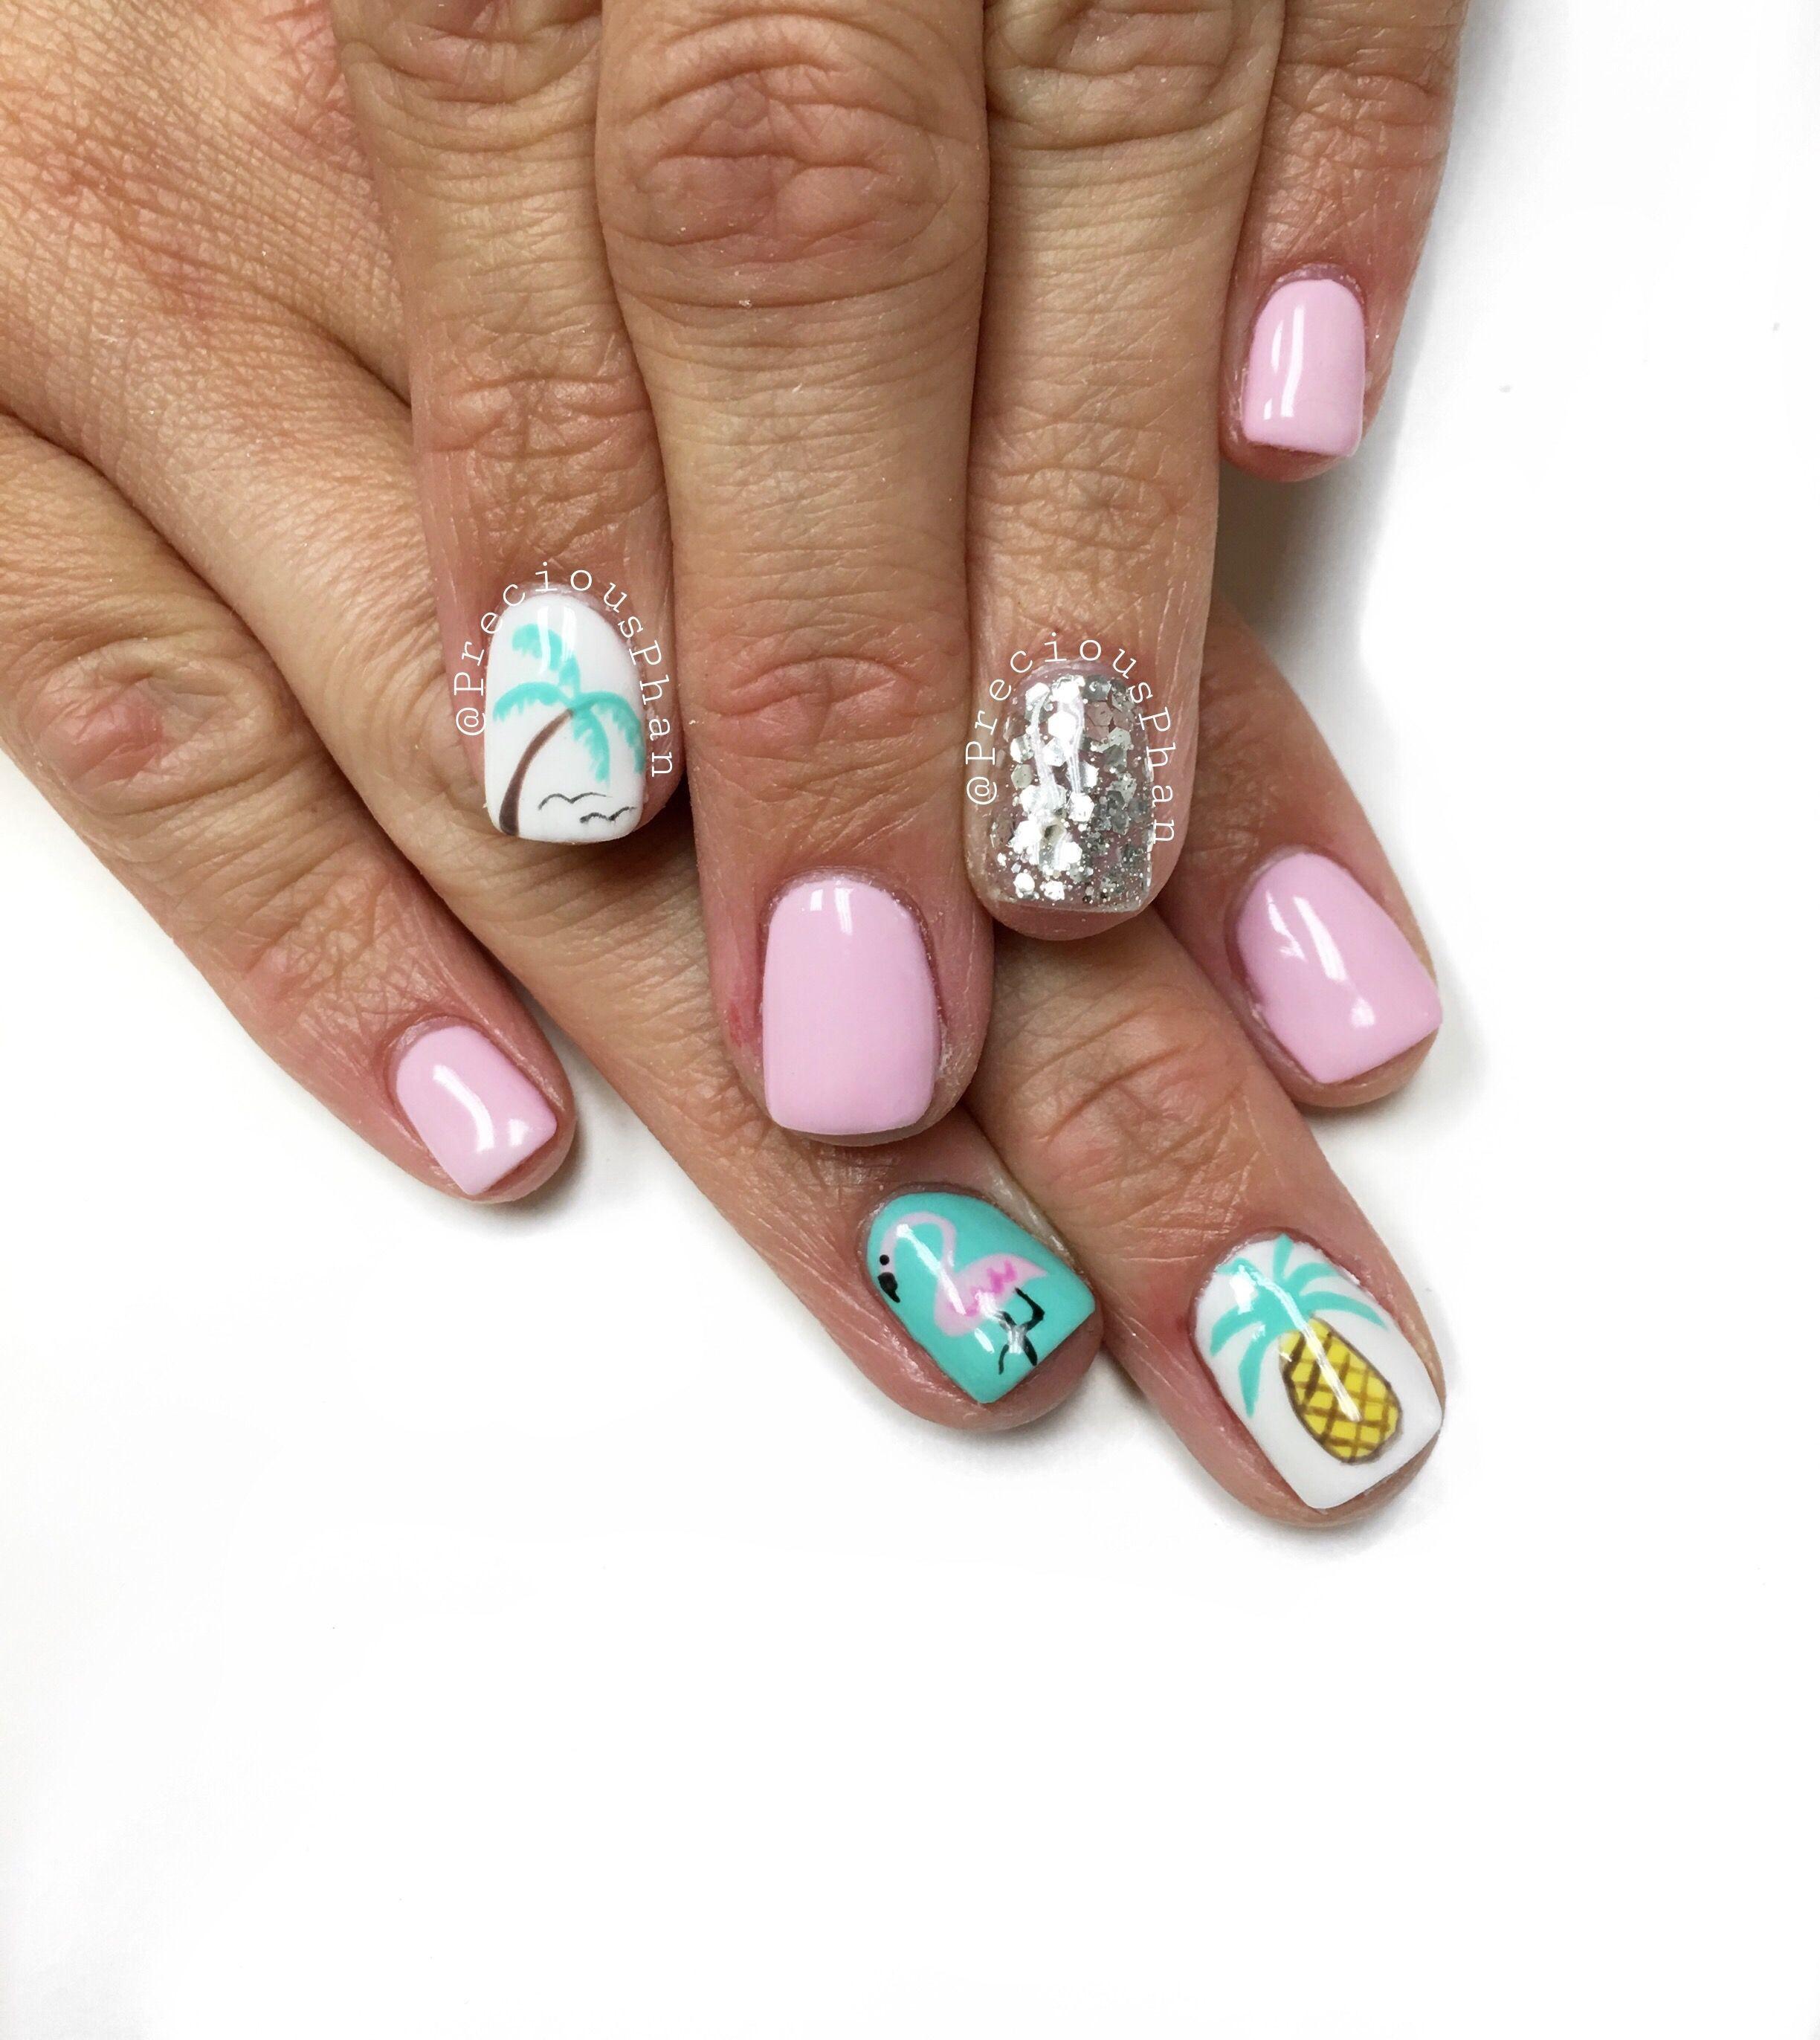 Nageldesign Strand  Summer nails Beach nails Vacation nails Palm trees